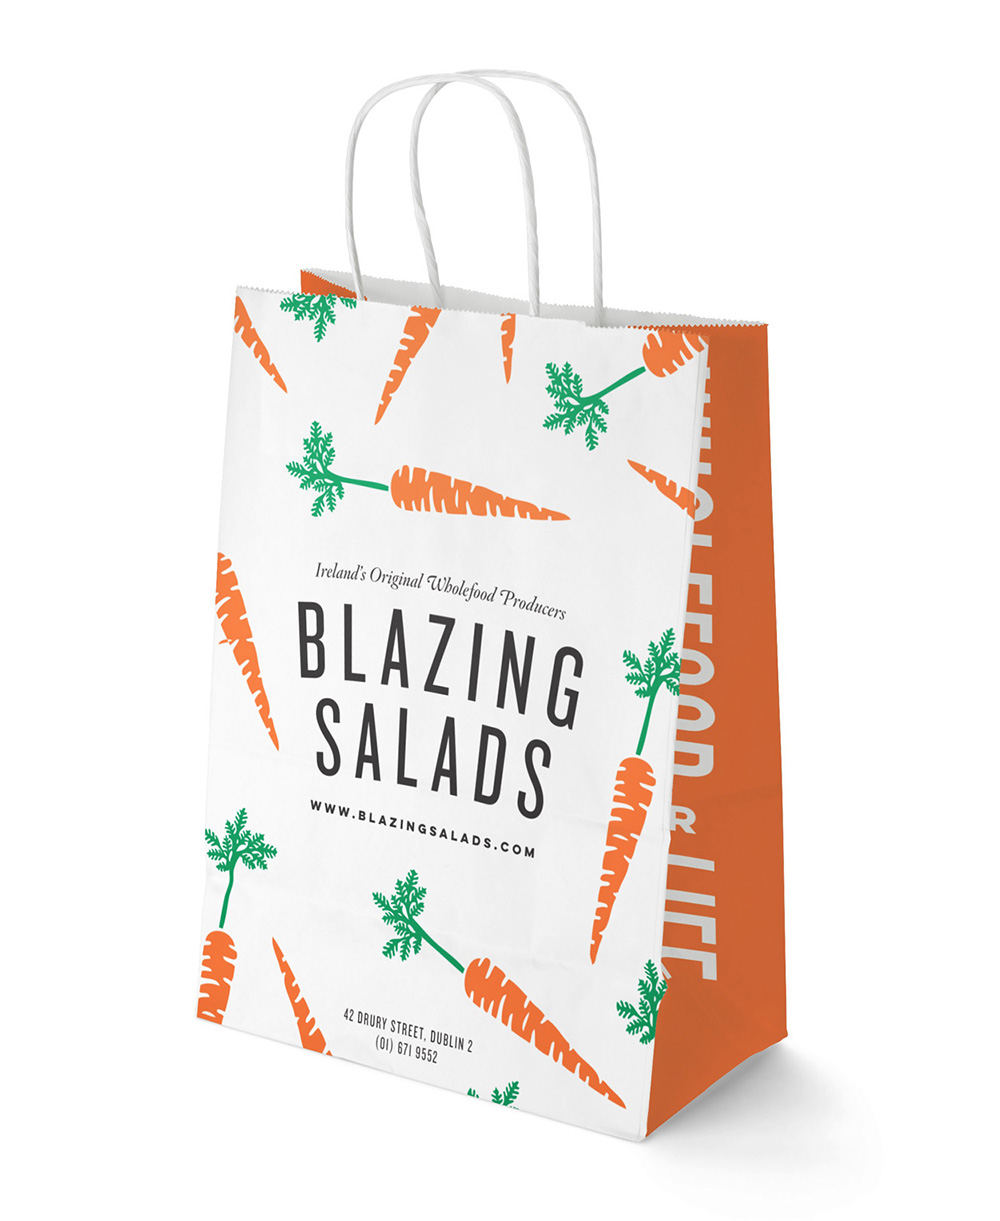 Blazing Salads bag